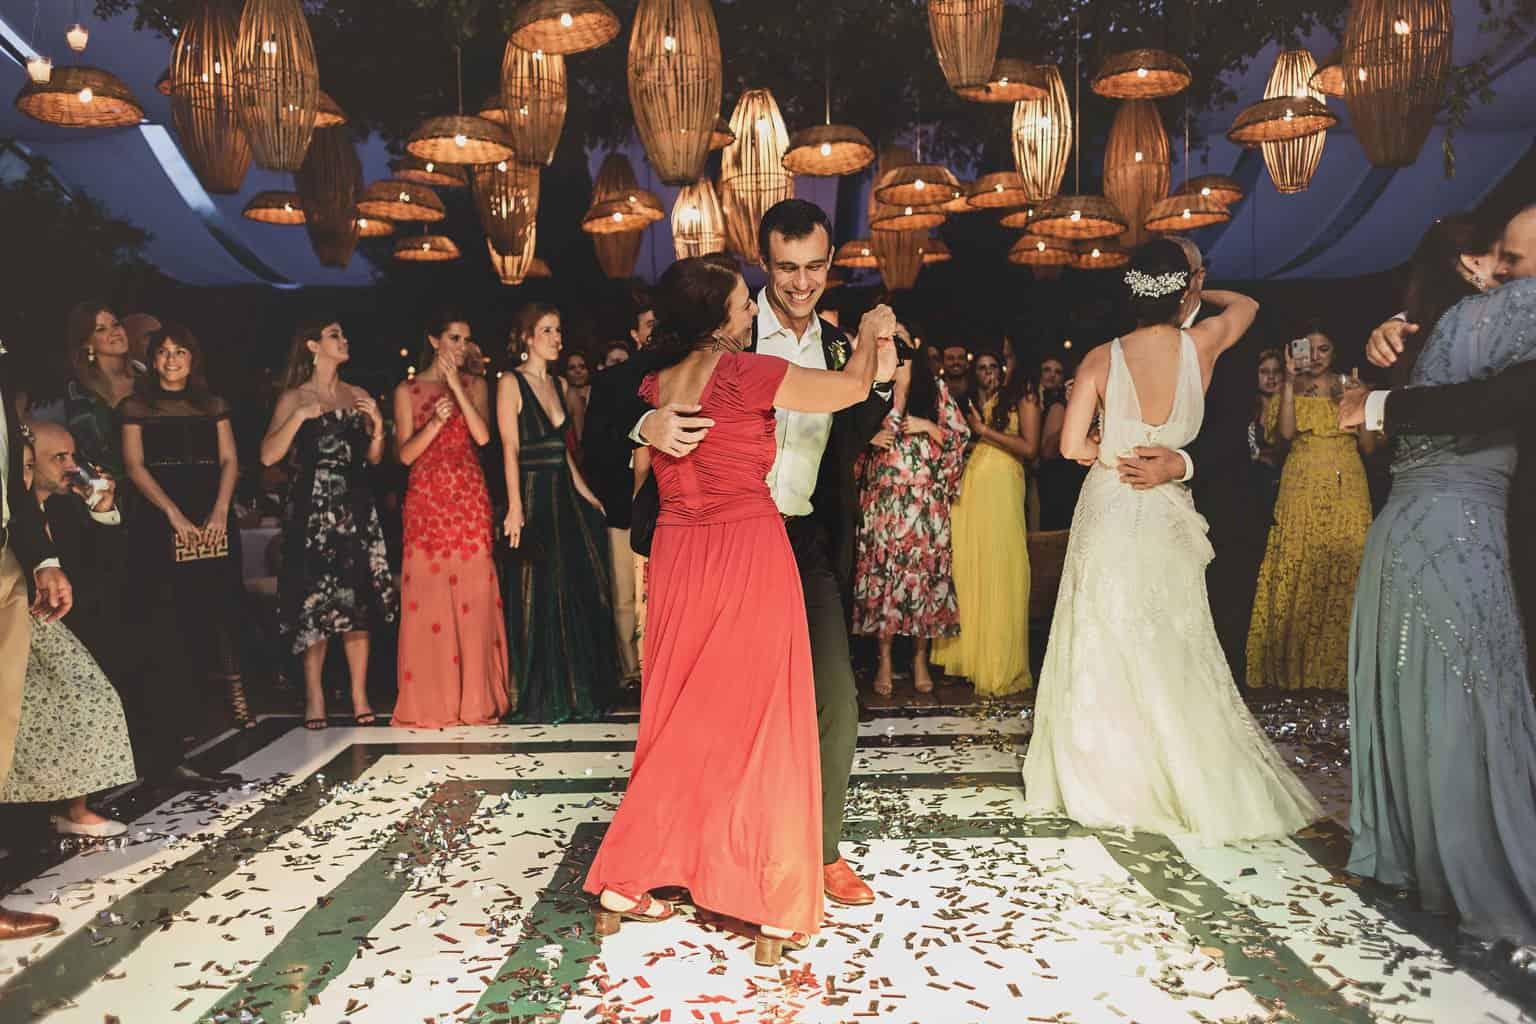 casamento-Ana-Cecilia-e-Leonardo-casamento-na-serra-festa-de-casamento-graviola-filmes-graviolafilmes-laura-camapnella-de-siervi-lauracampanella-studio-laura-camapnella2-2